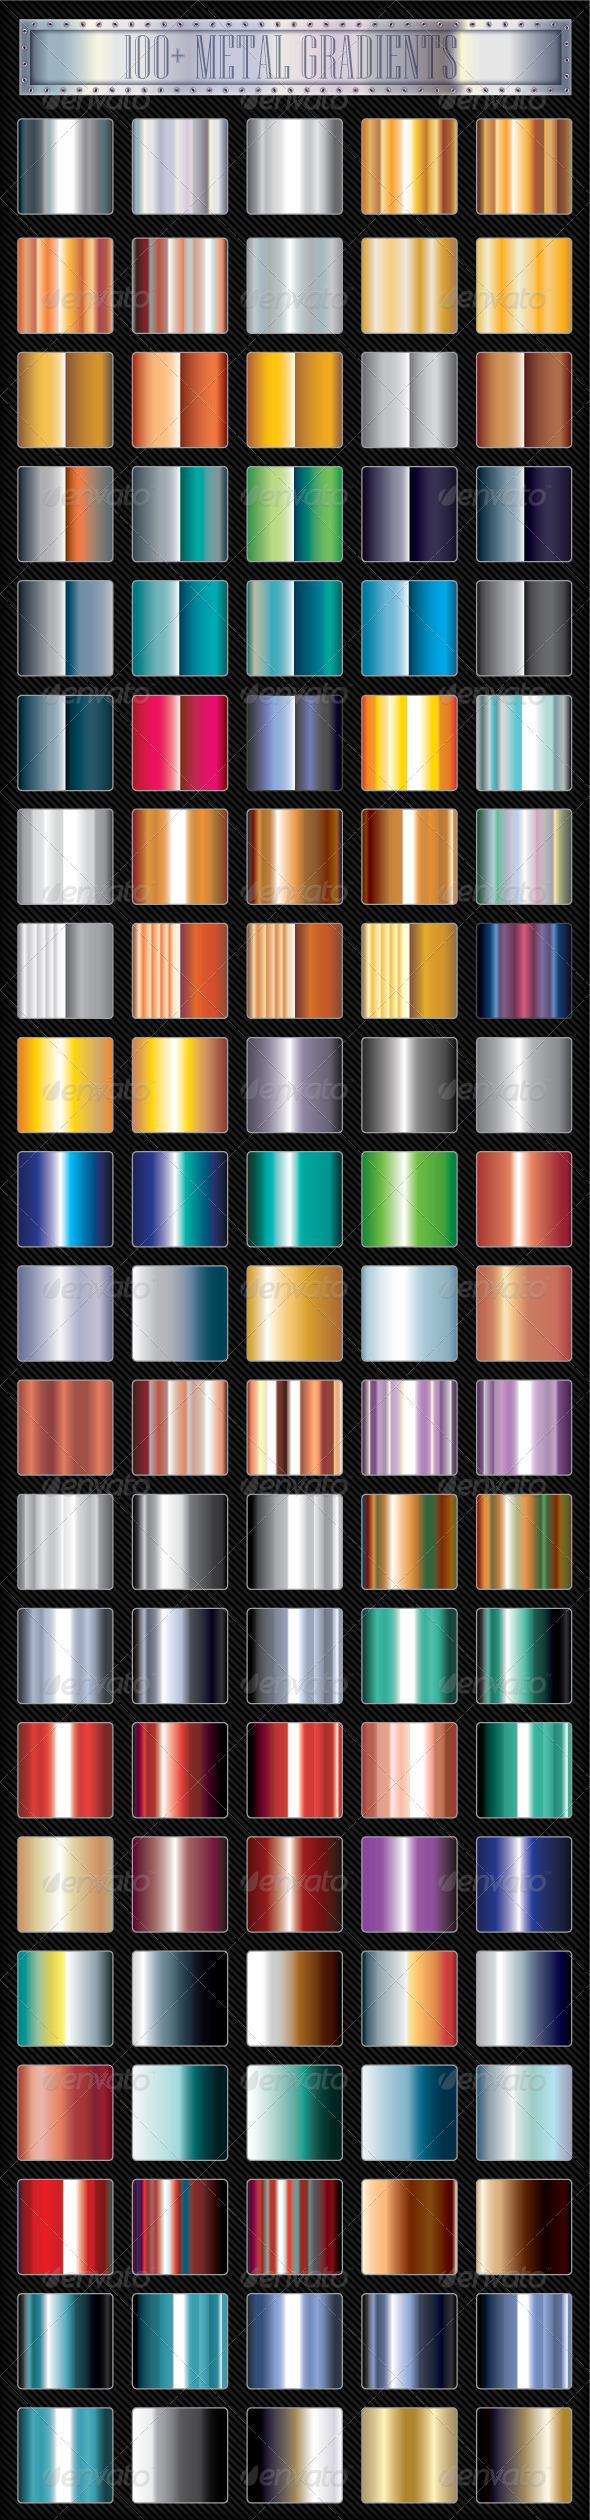 Metal Gradients Adobe illustrator pattern, Metal